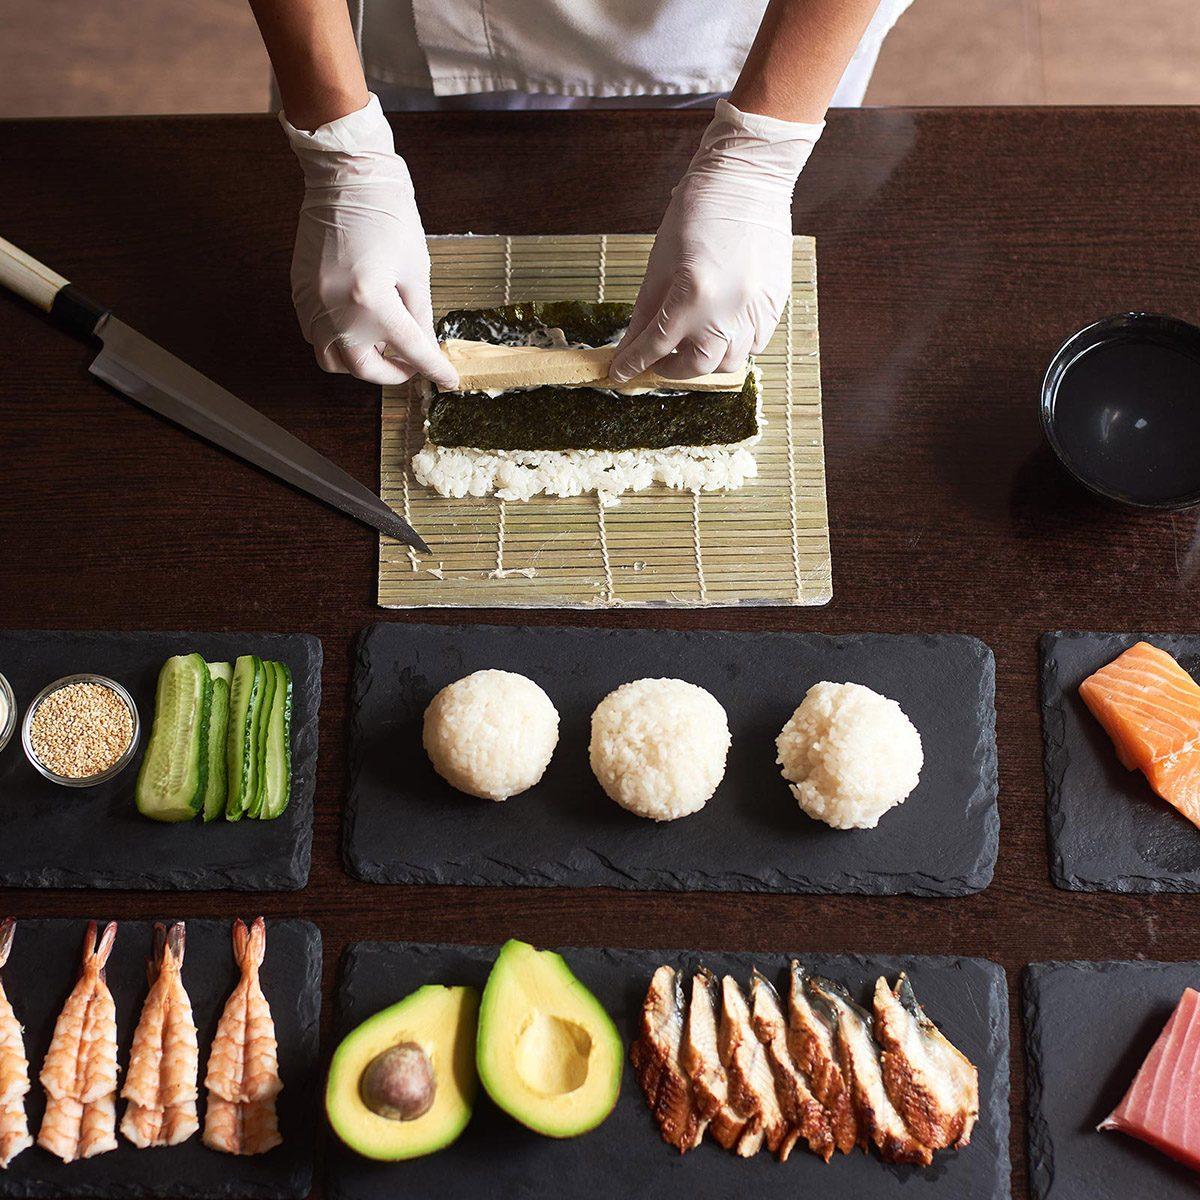 Preparing sushi